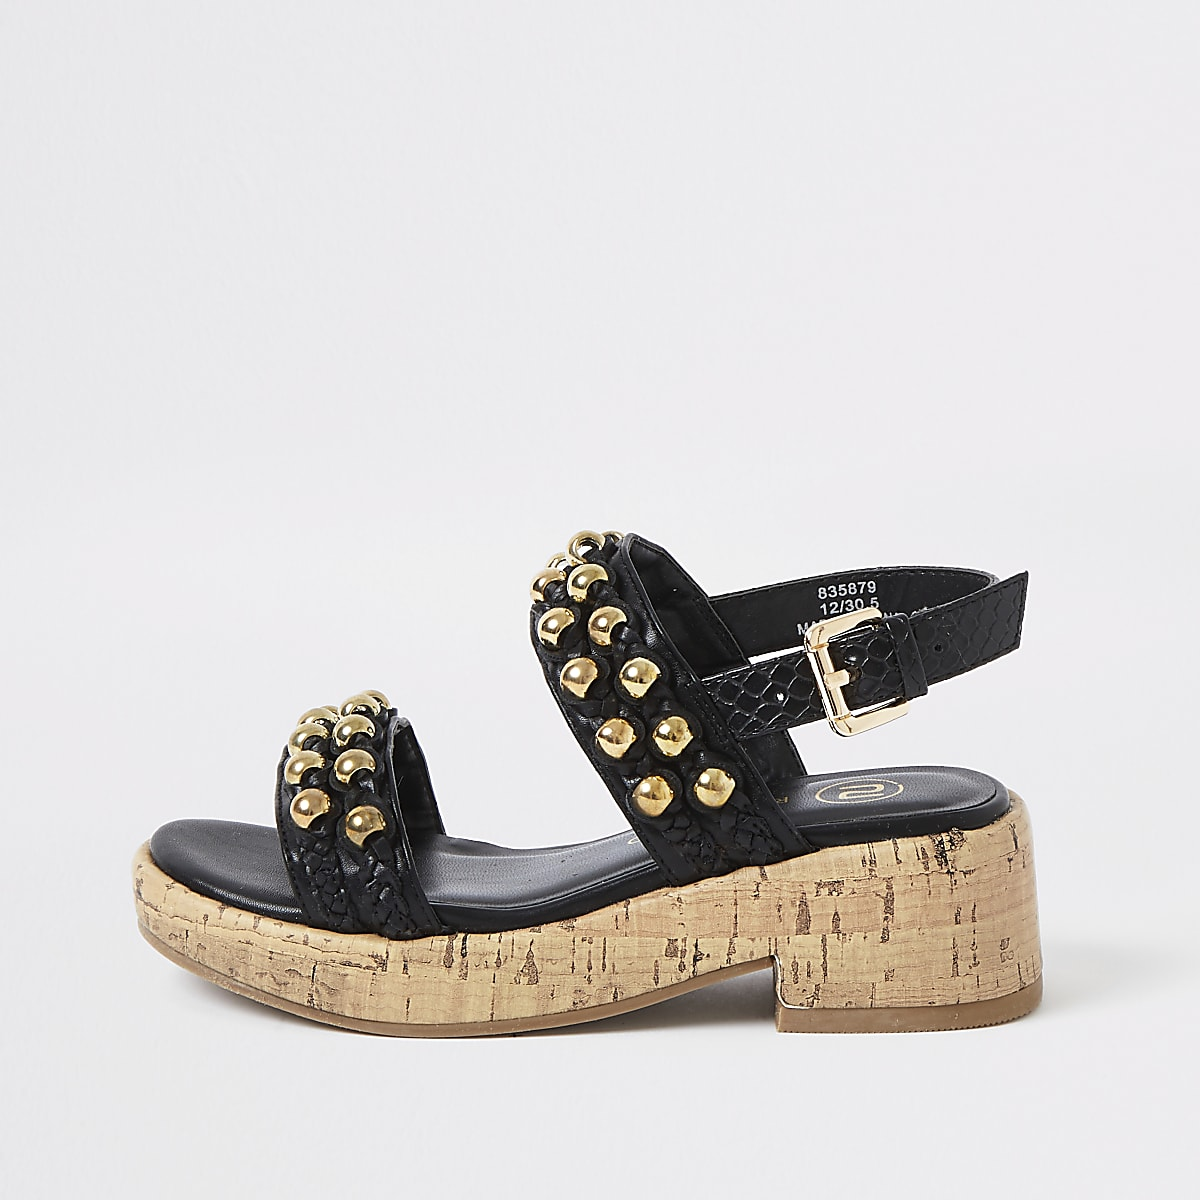 Girls black embellished cork clumpy sandals